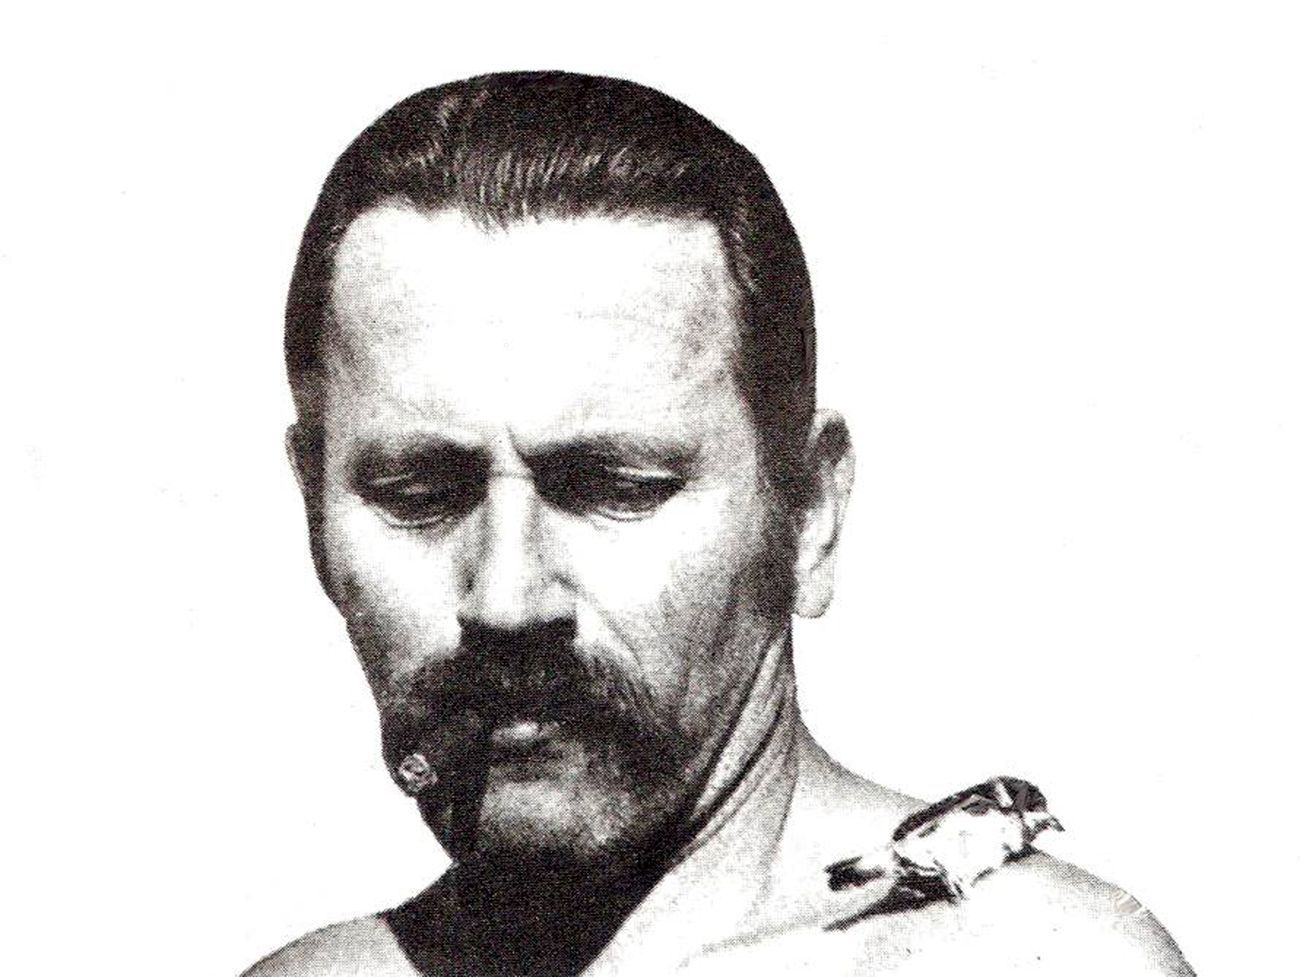 Ilija Šoškić, Icarus (Sparrow on Shoulder), 1973. Photo documentation Arhiv Šoškić